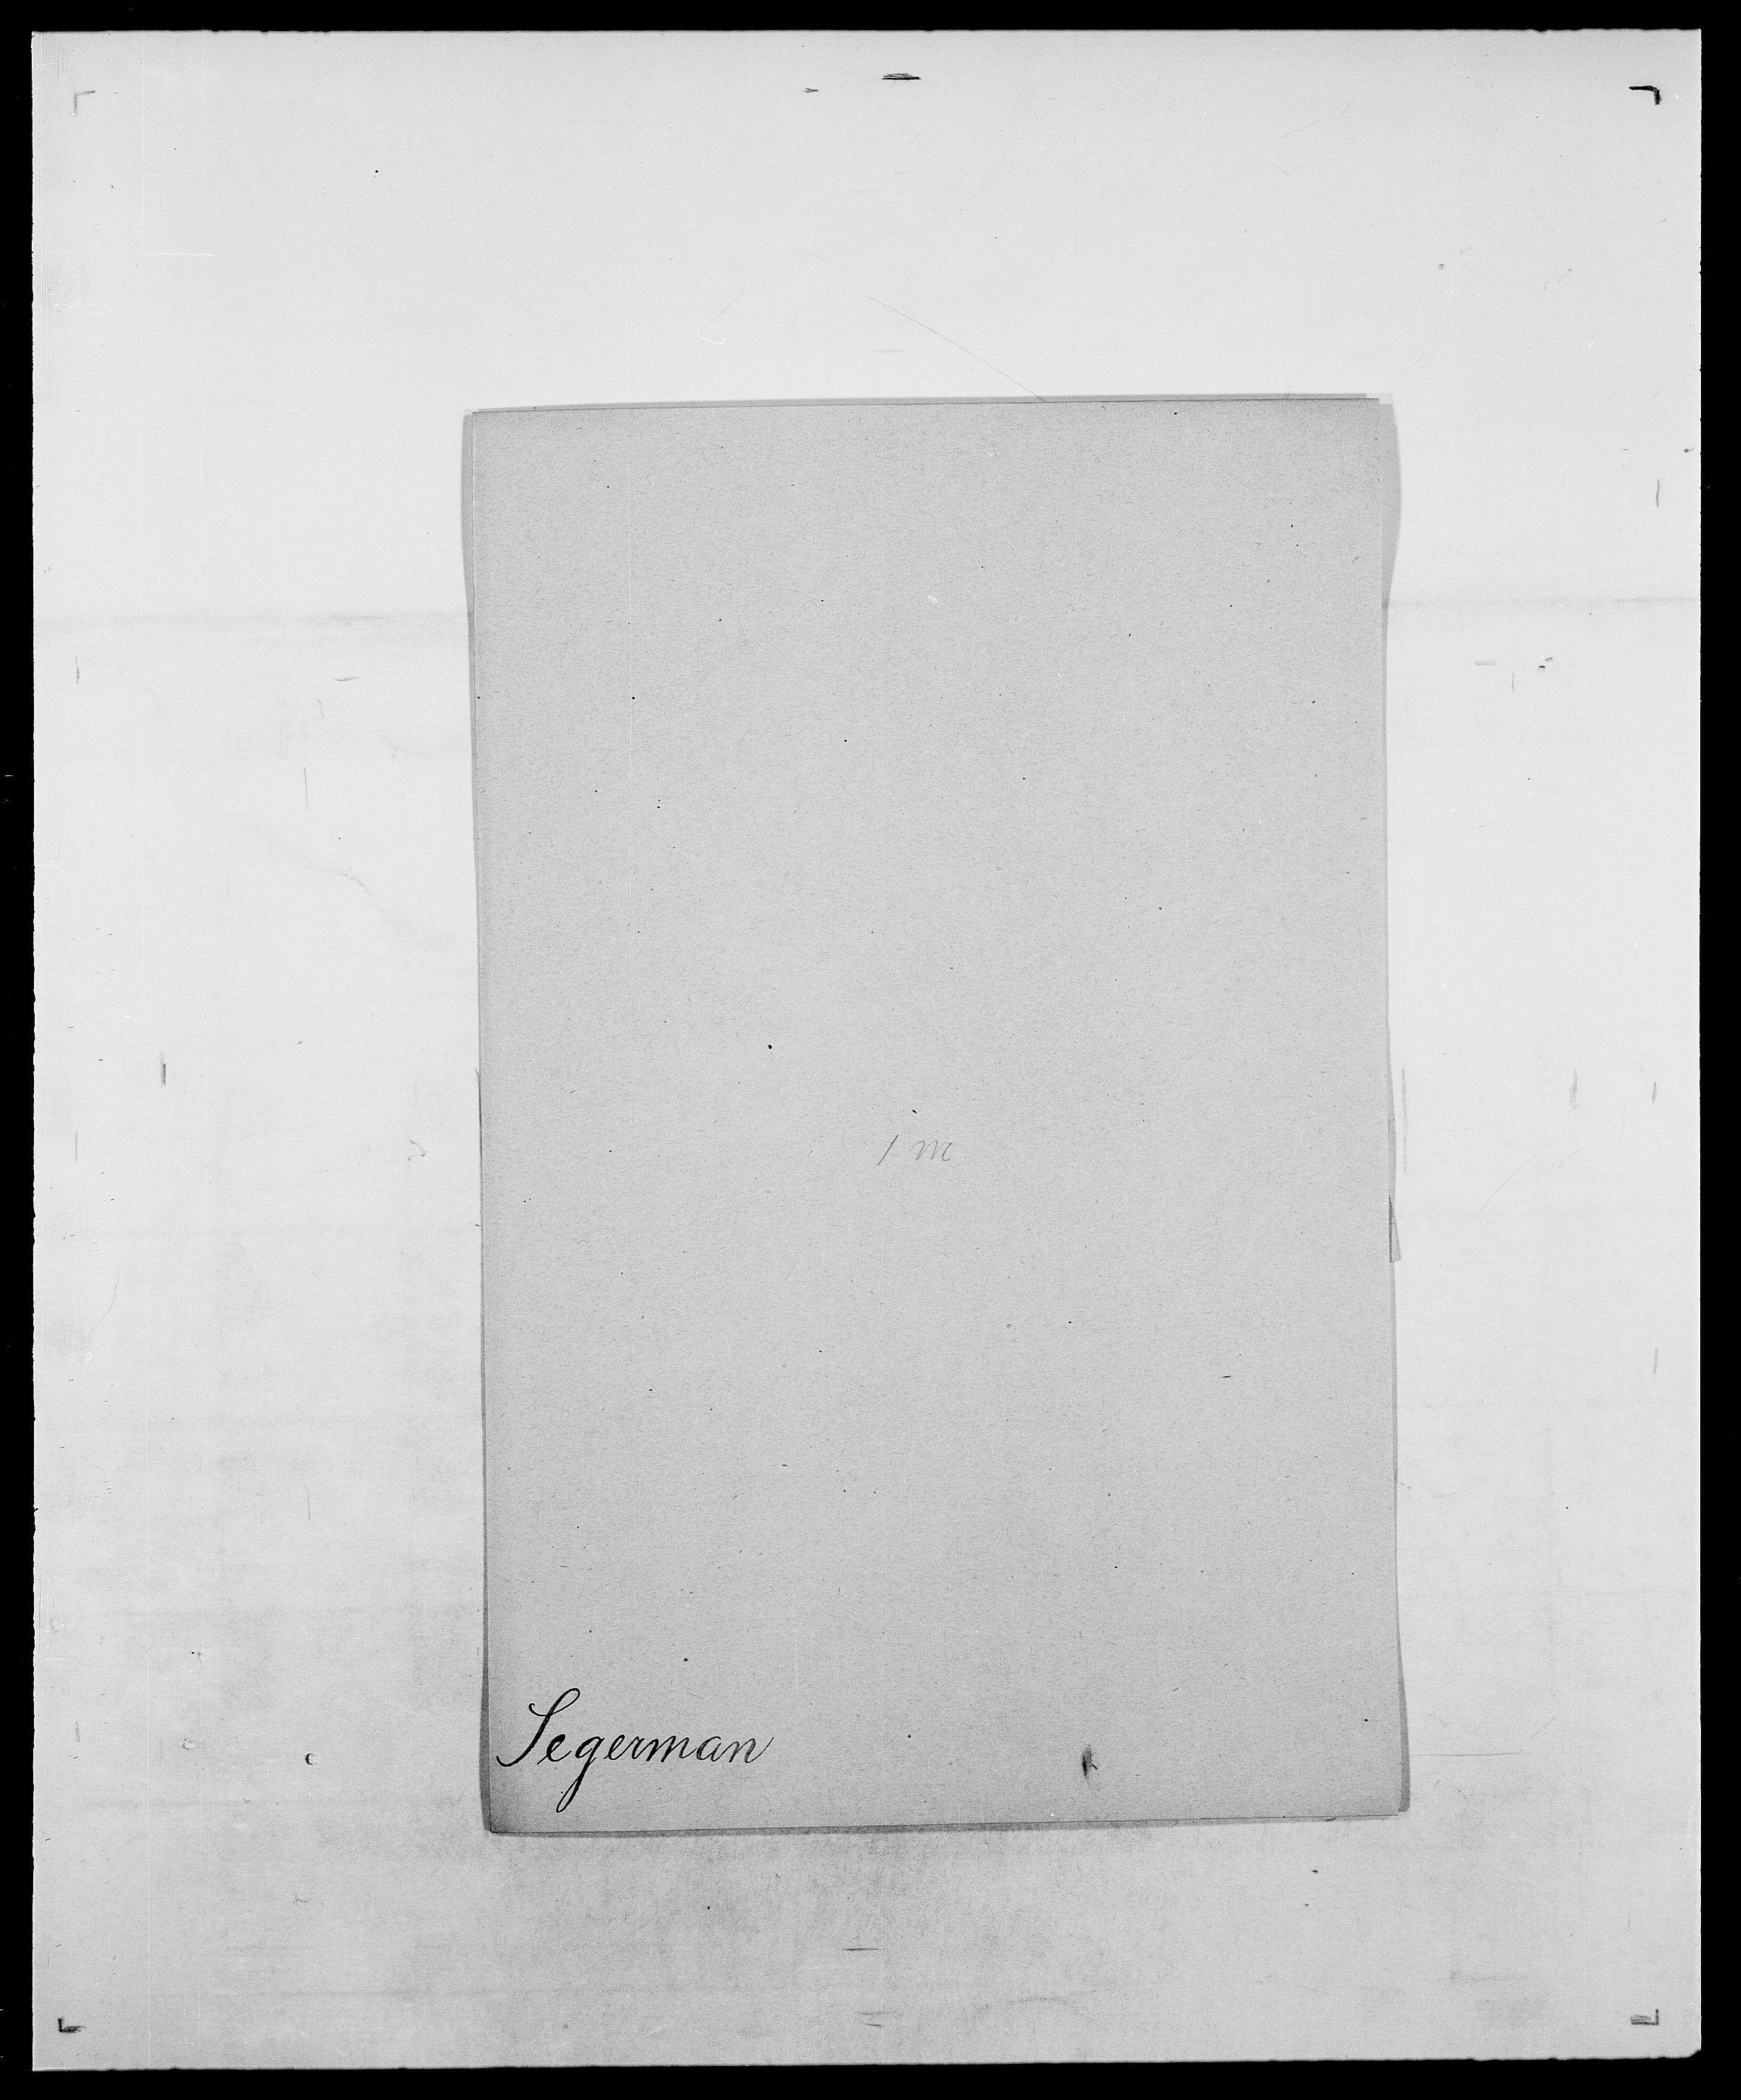 SAO, Delgobe, Charles Antoine - samling, D/Da/L0035: Schnabel - sjetman, s. 591